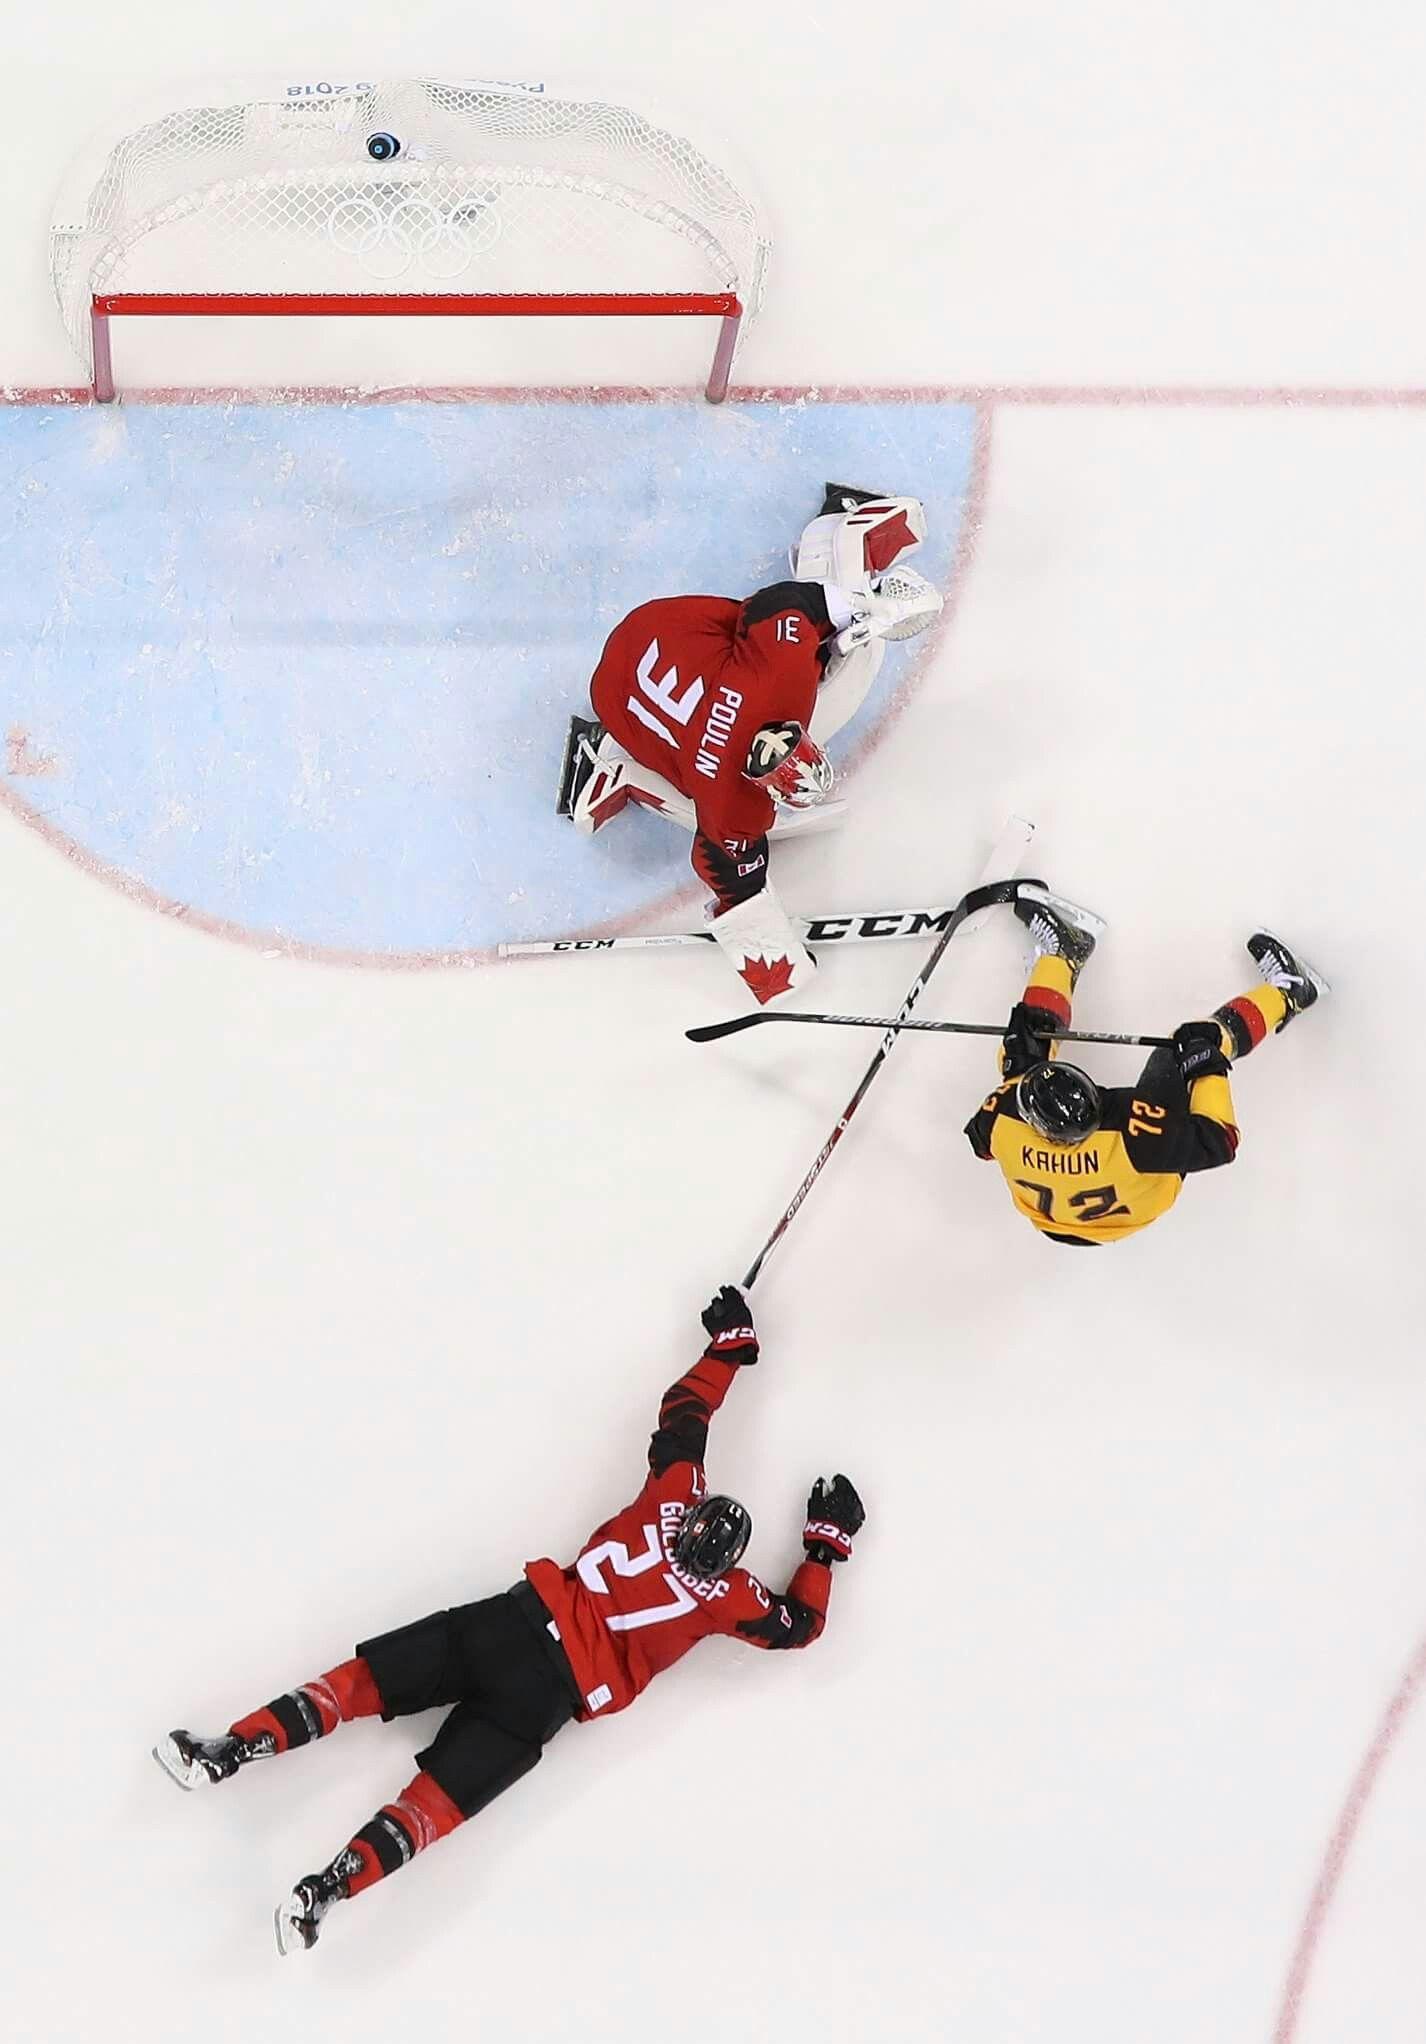 Hockey. February 23. ,Day 14 Multisport event, Winter